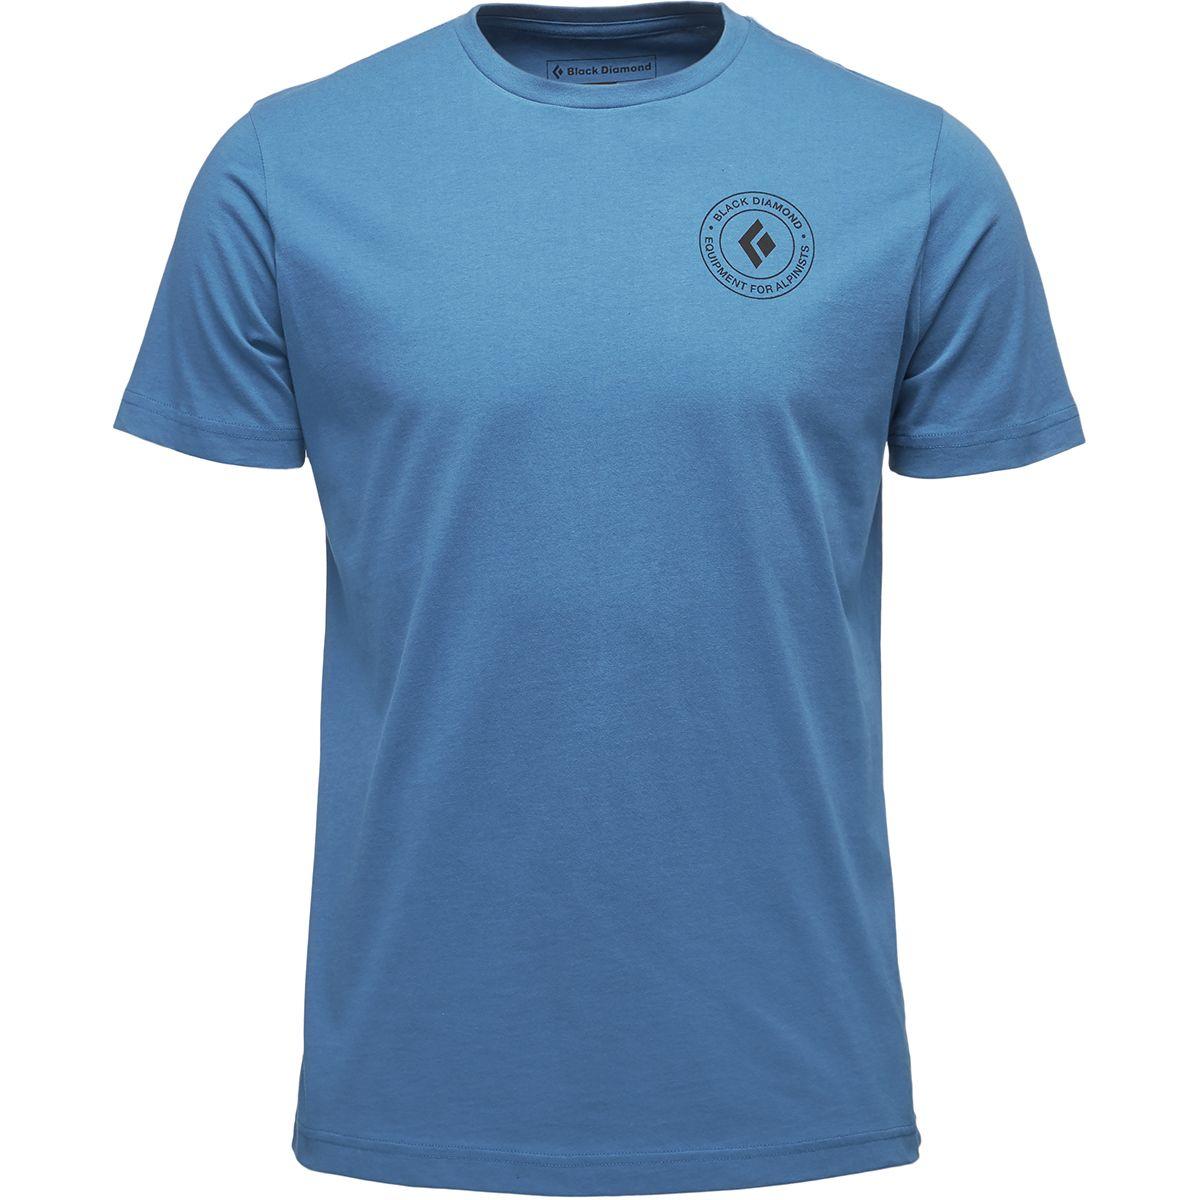 Black Diamond Circle Logo T-Shirt - Men's